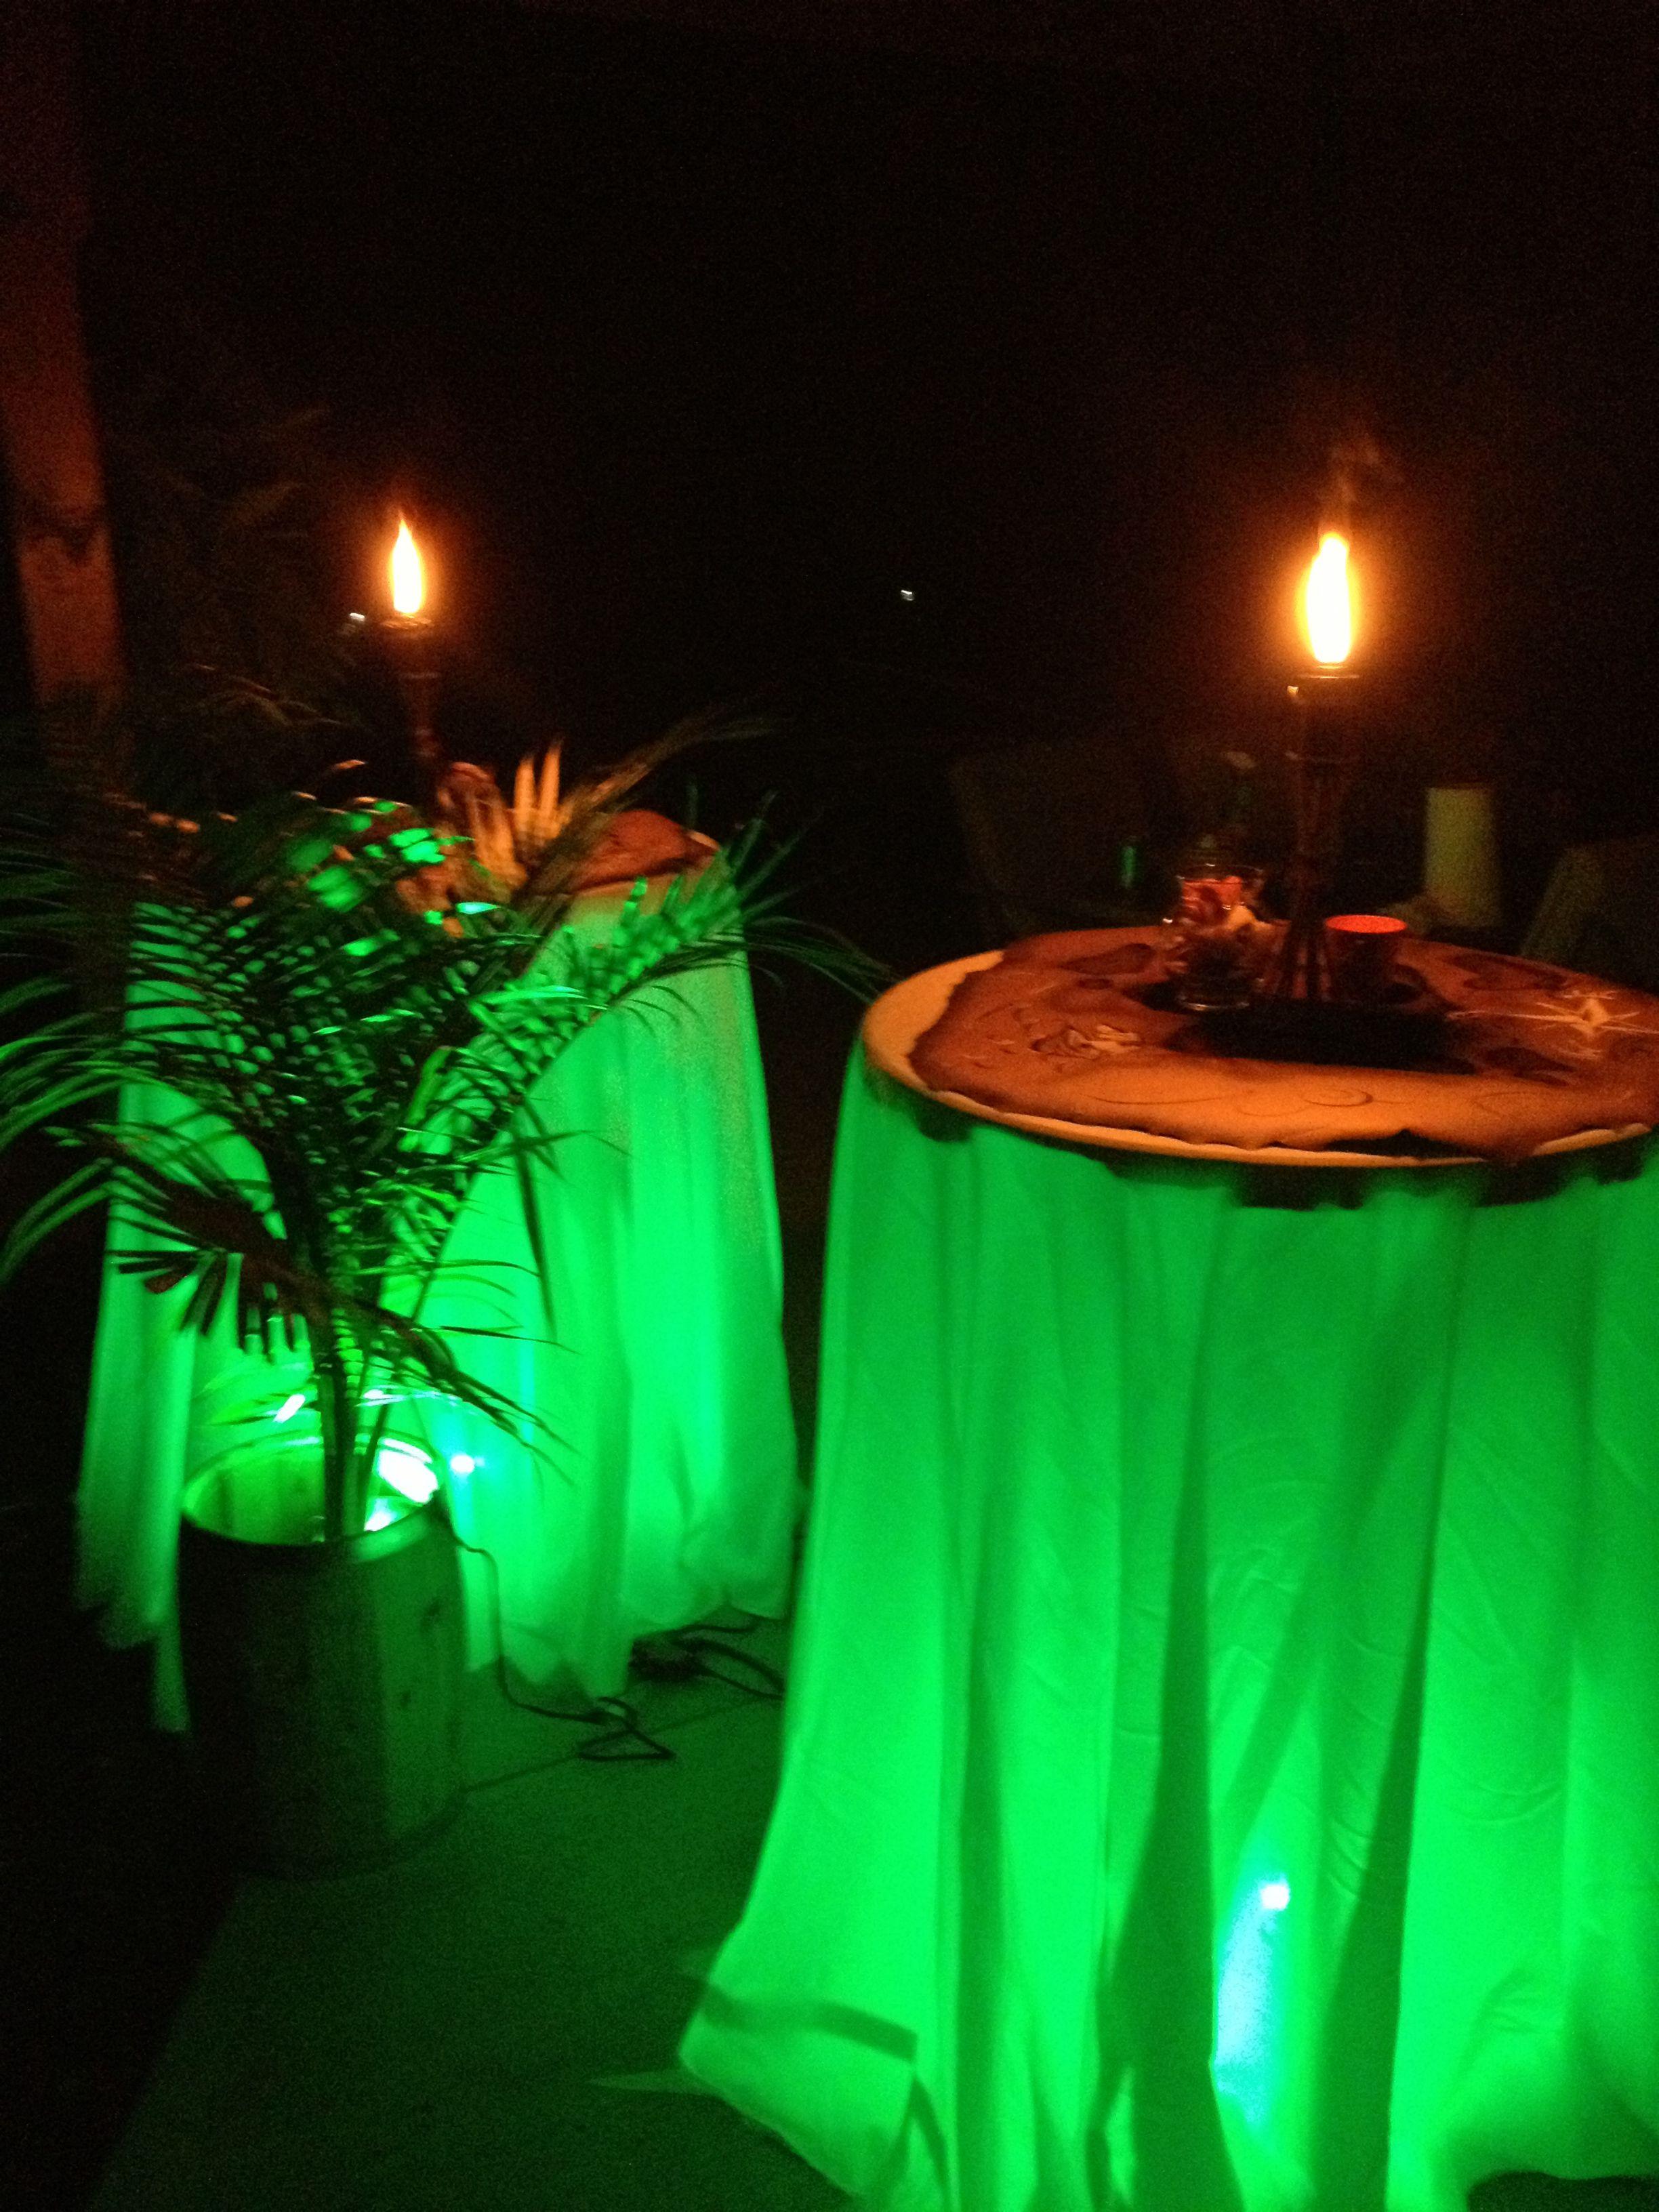 Underlit Tables For A Luau Party Luau Tableideas Weddingtables